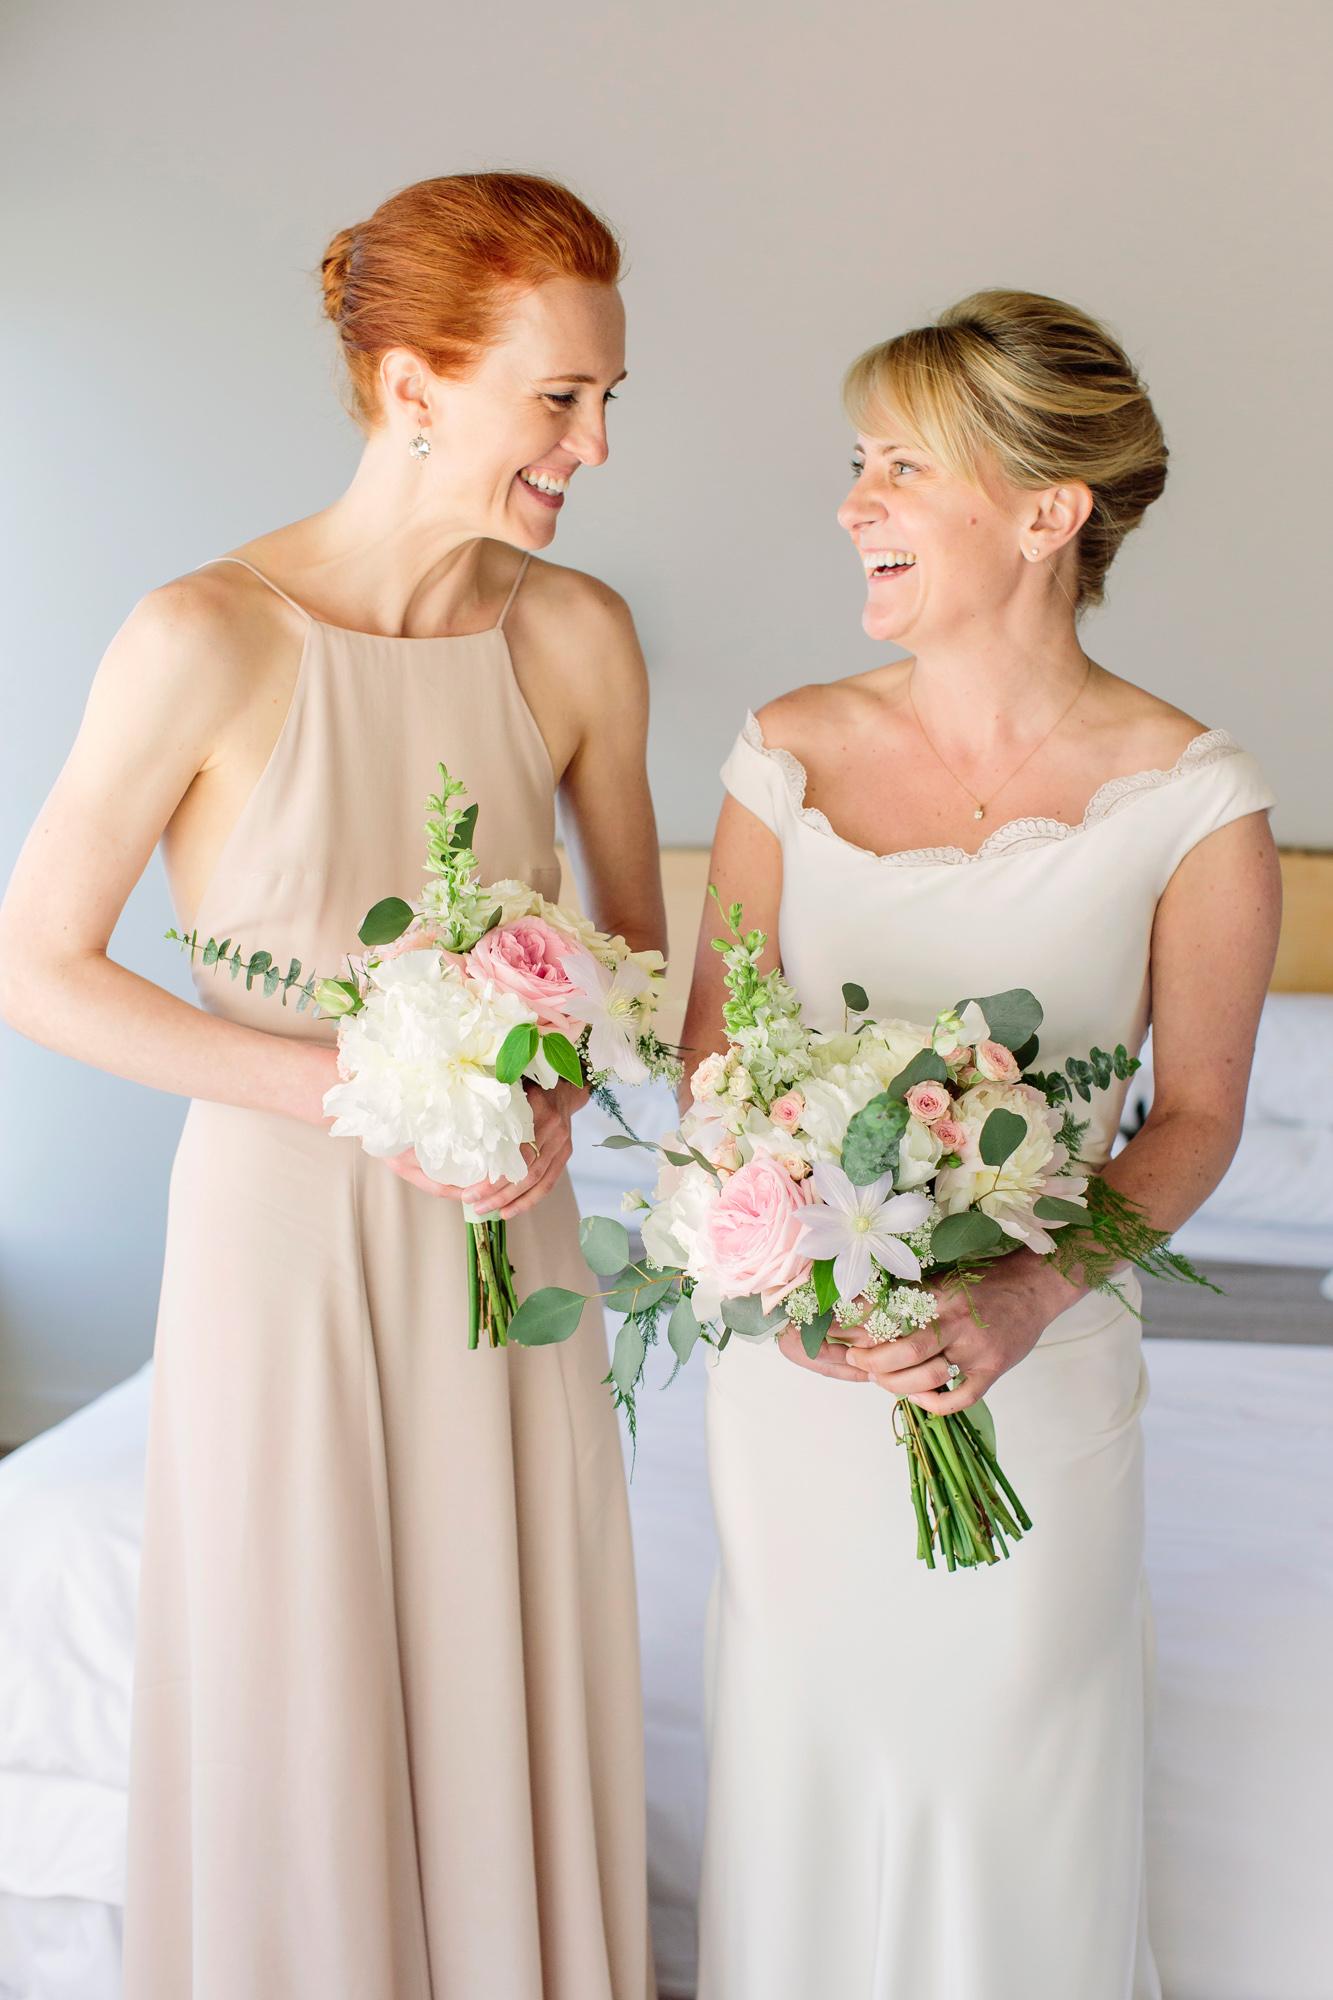 19_Rowan_Brian_The_Roundhouse_Wedding_Beacon_NY_Tanya_Salazar_Photography_111.jpg